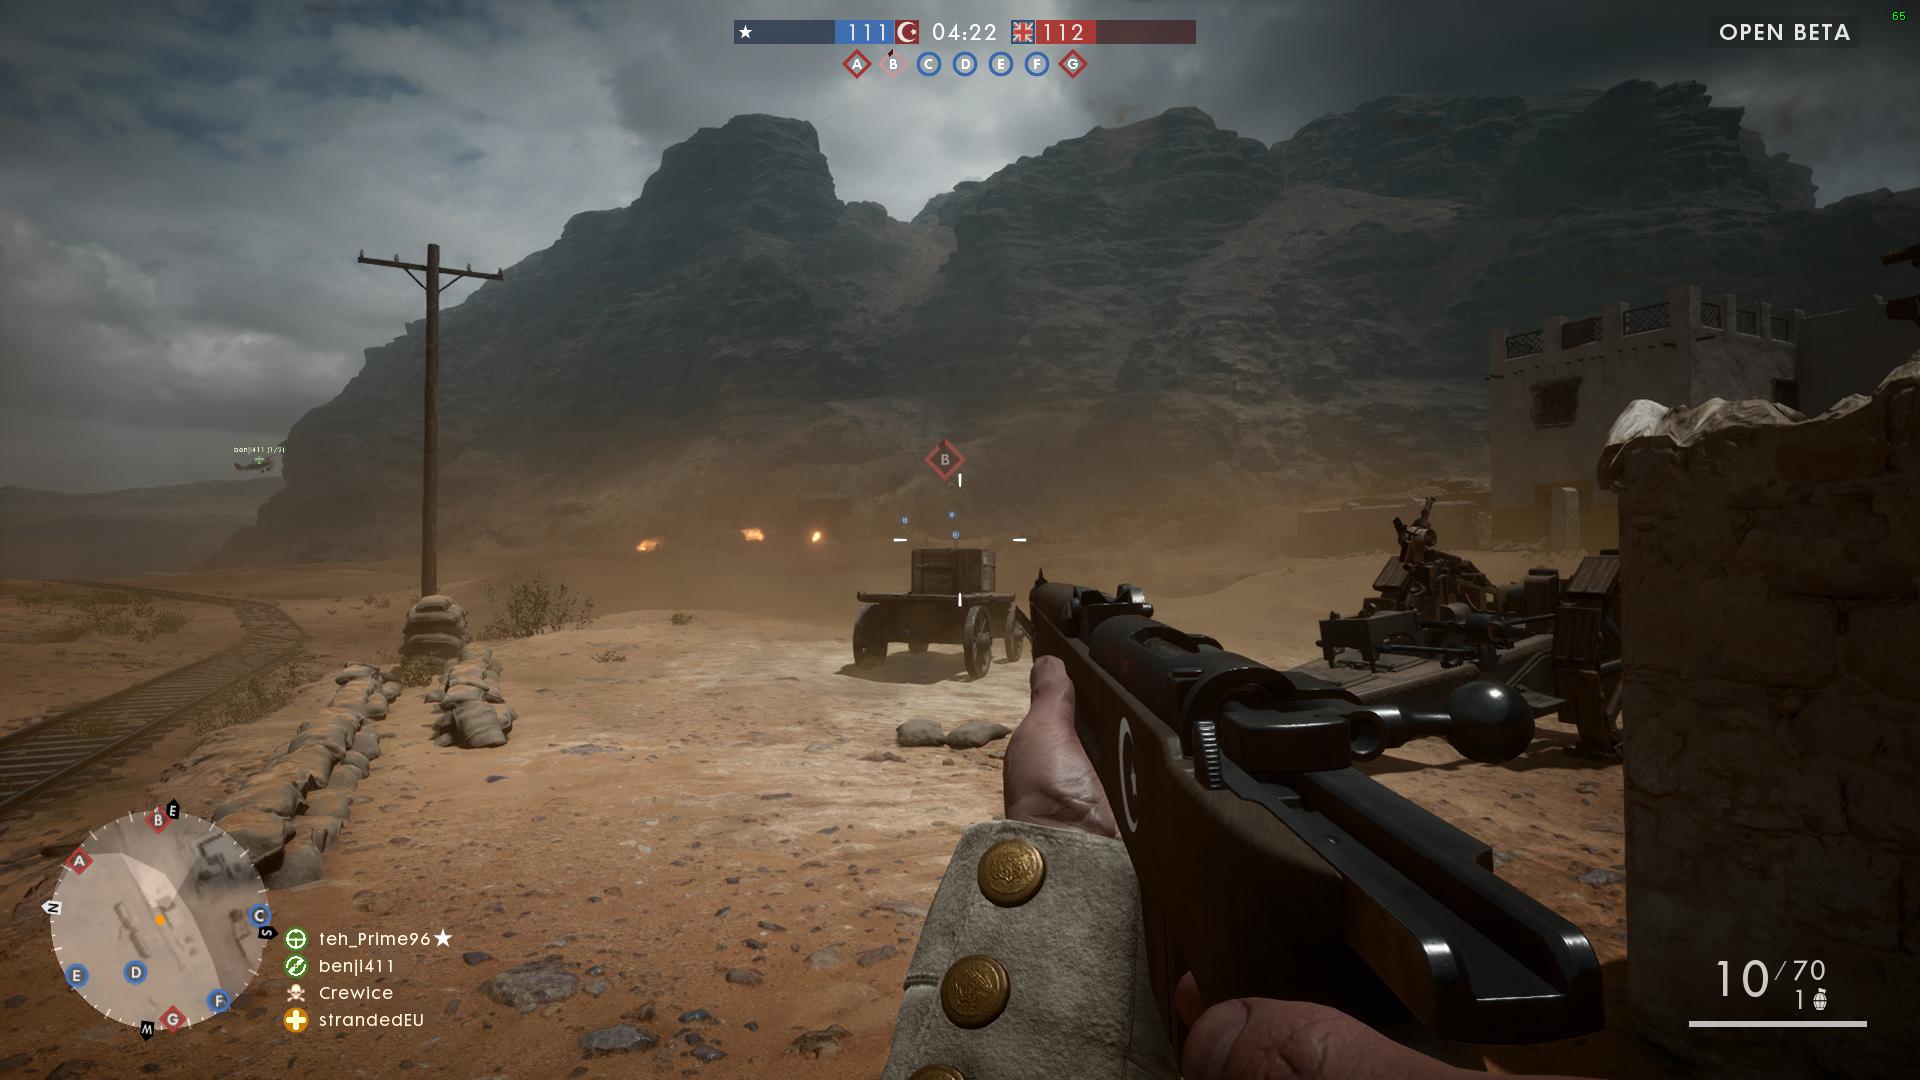 Battlefield 1 open beta код активации - 0